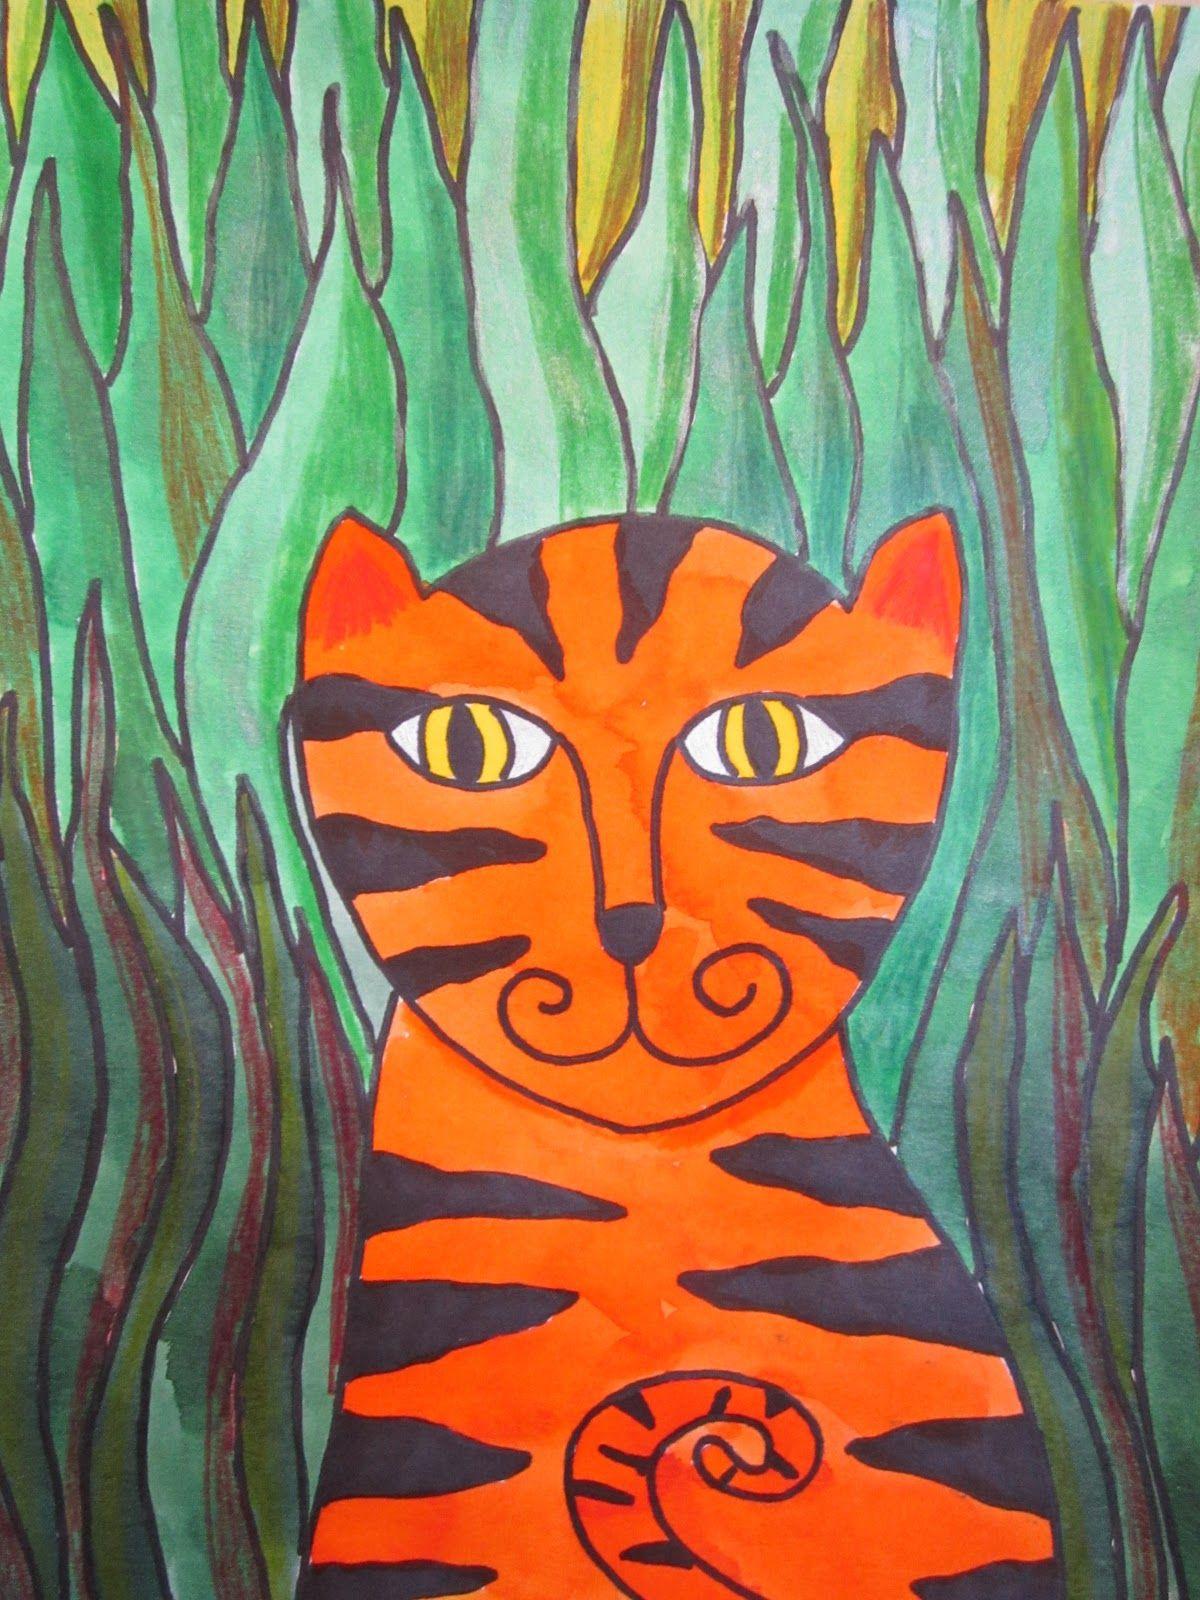 Henri Rousseau For Kids Google Search Tiger Art Animal Art Elementary Art Projects